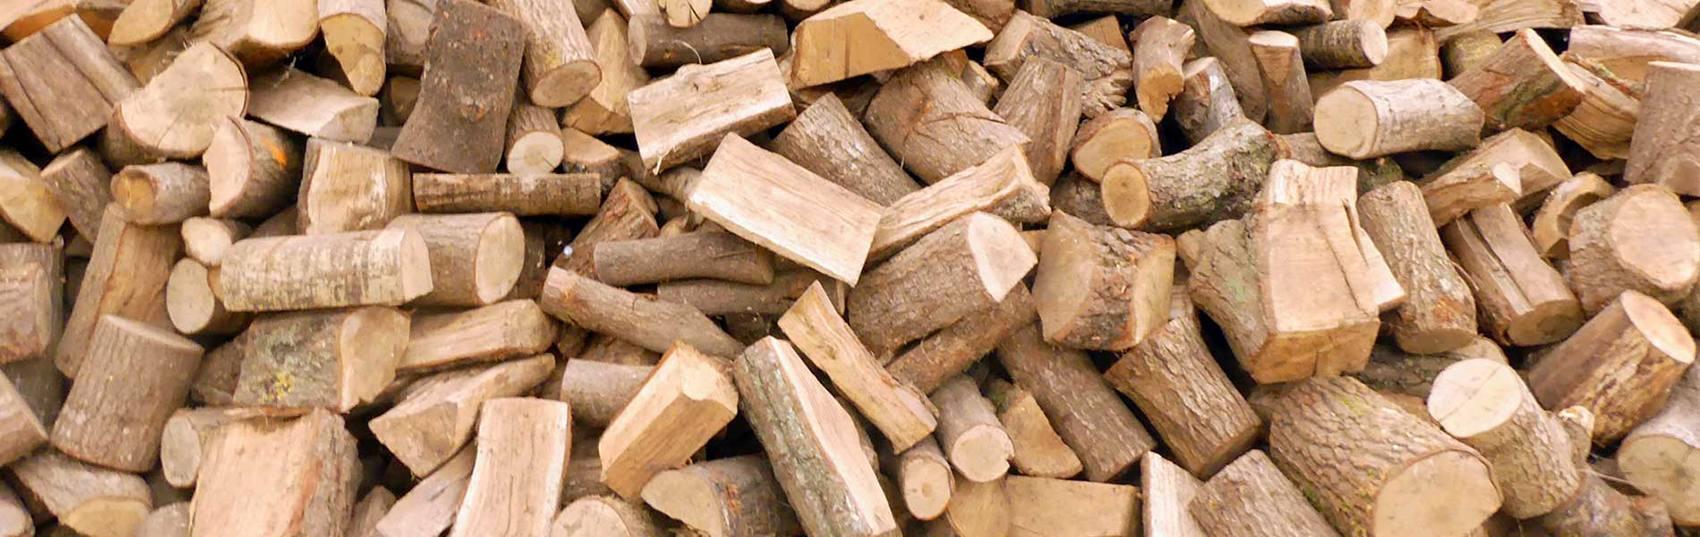 Firewood header